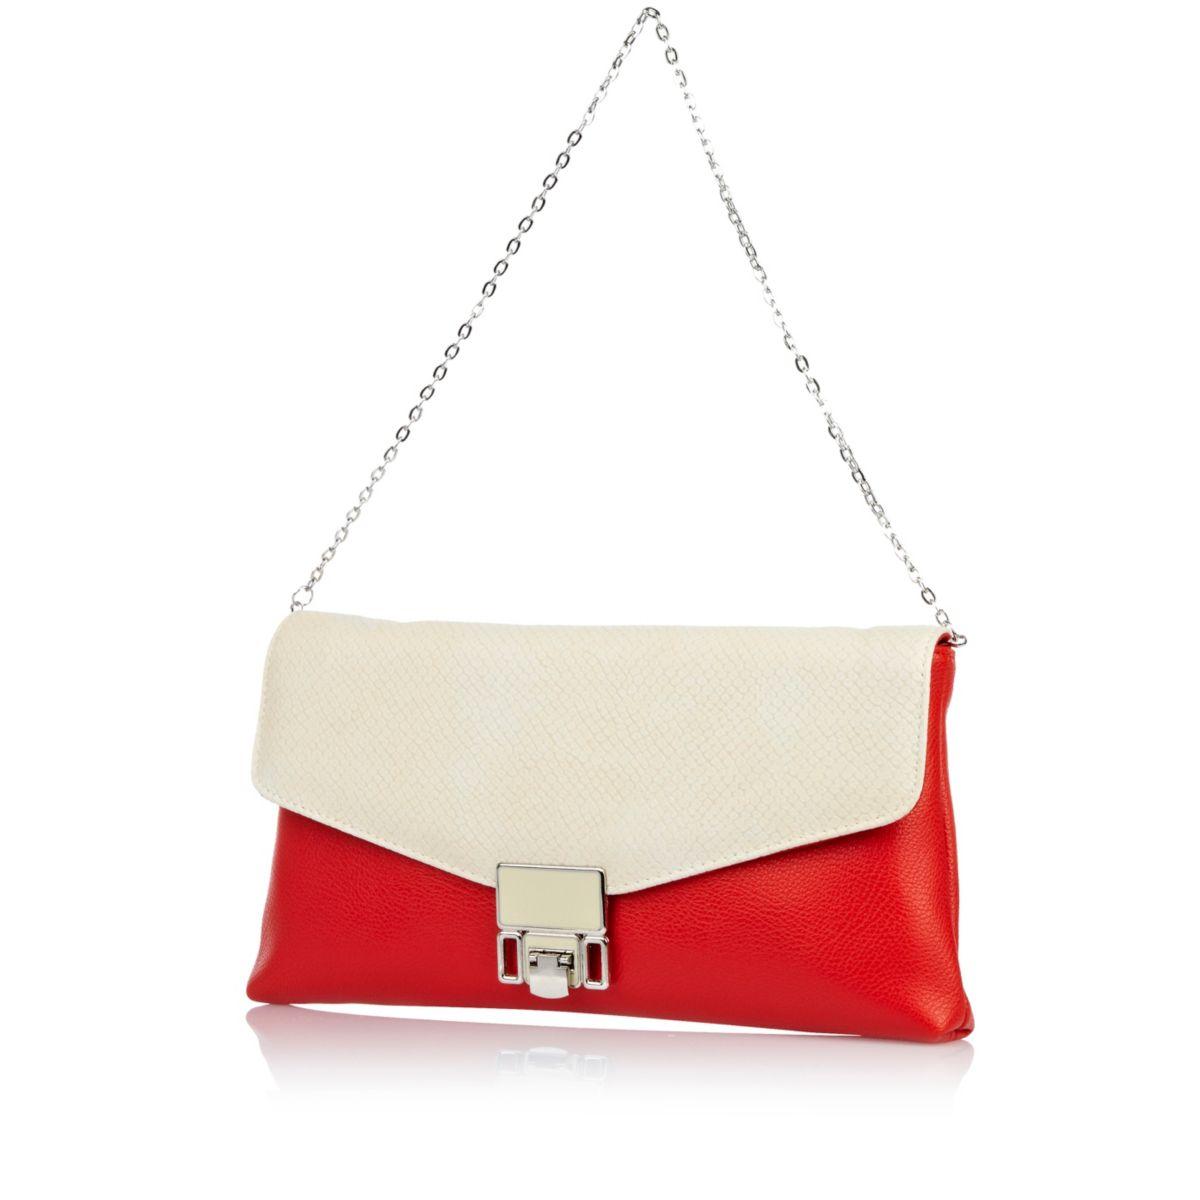 Red color block soft clutch bag